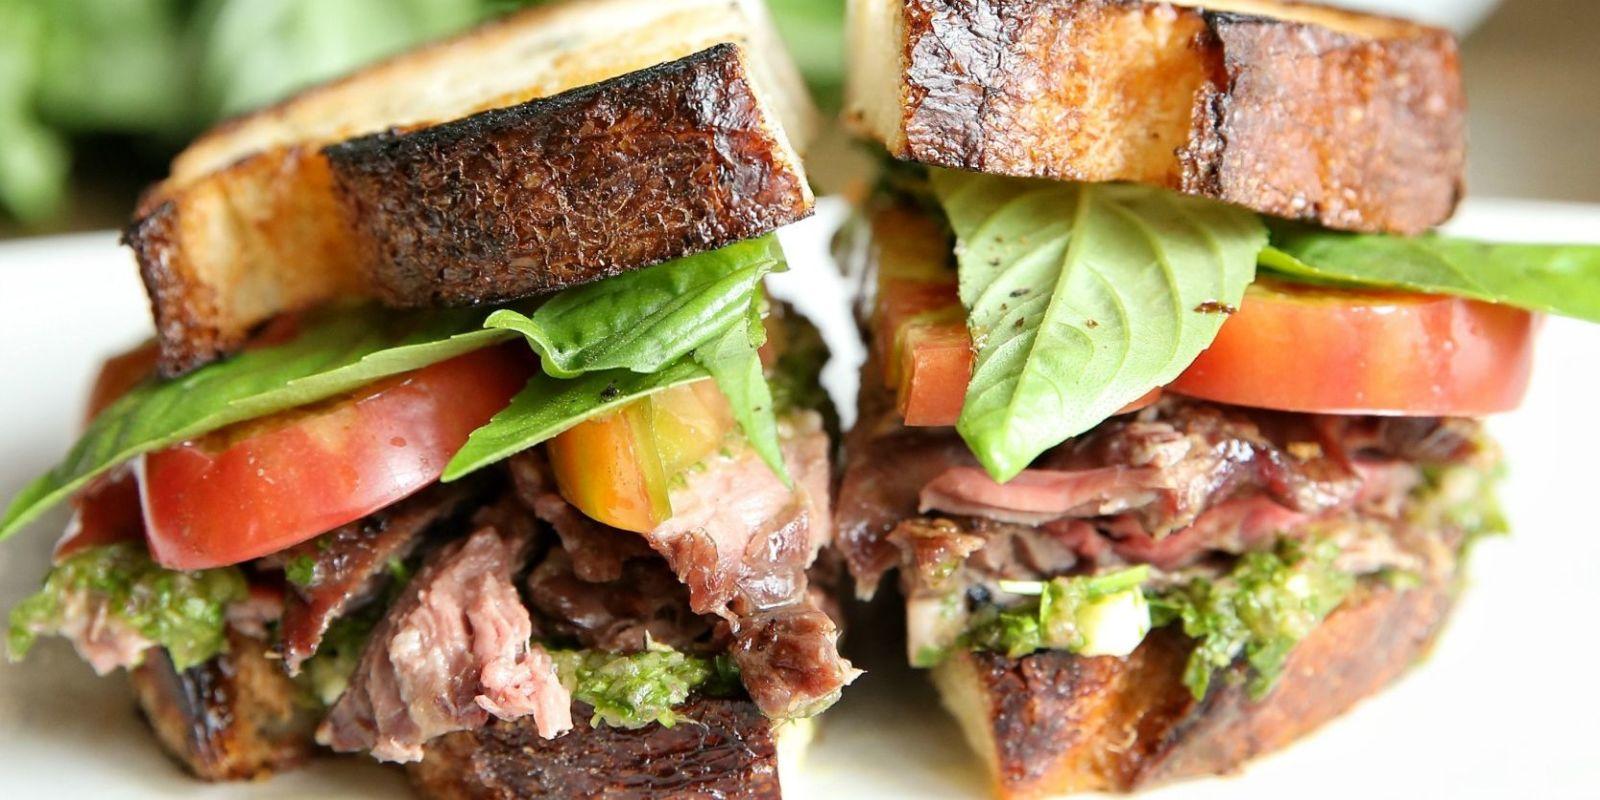 Best Chimichurri Steak Sandwich Recipe - Delish.com